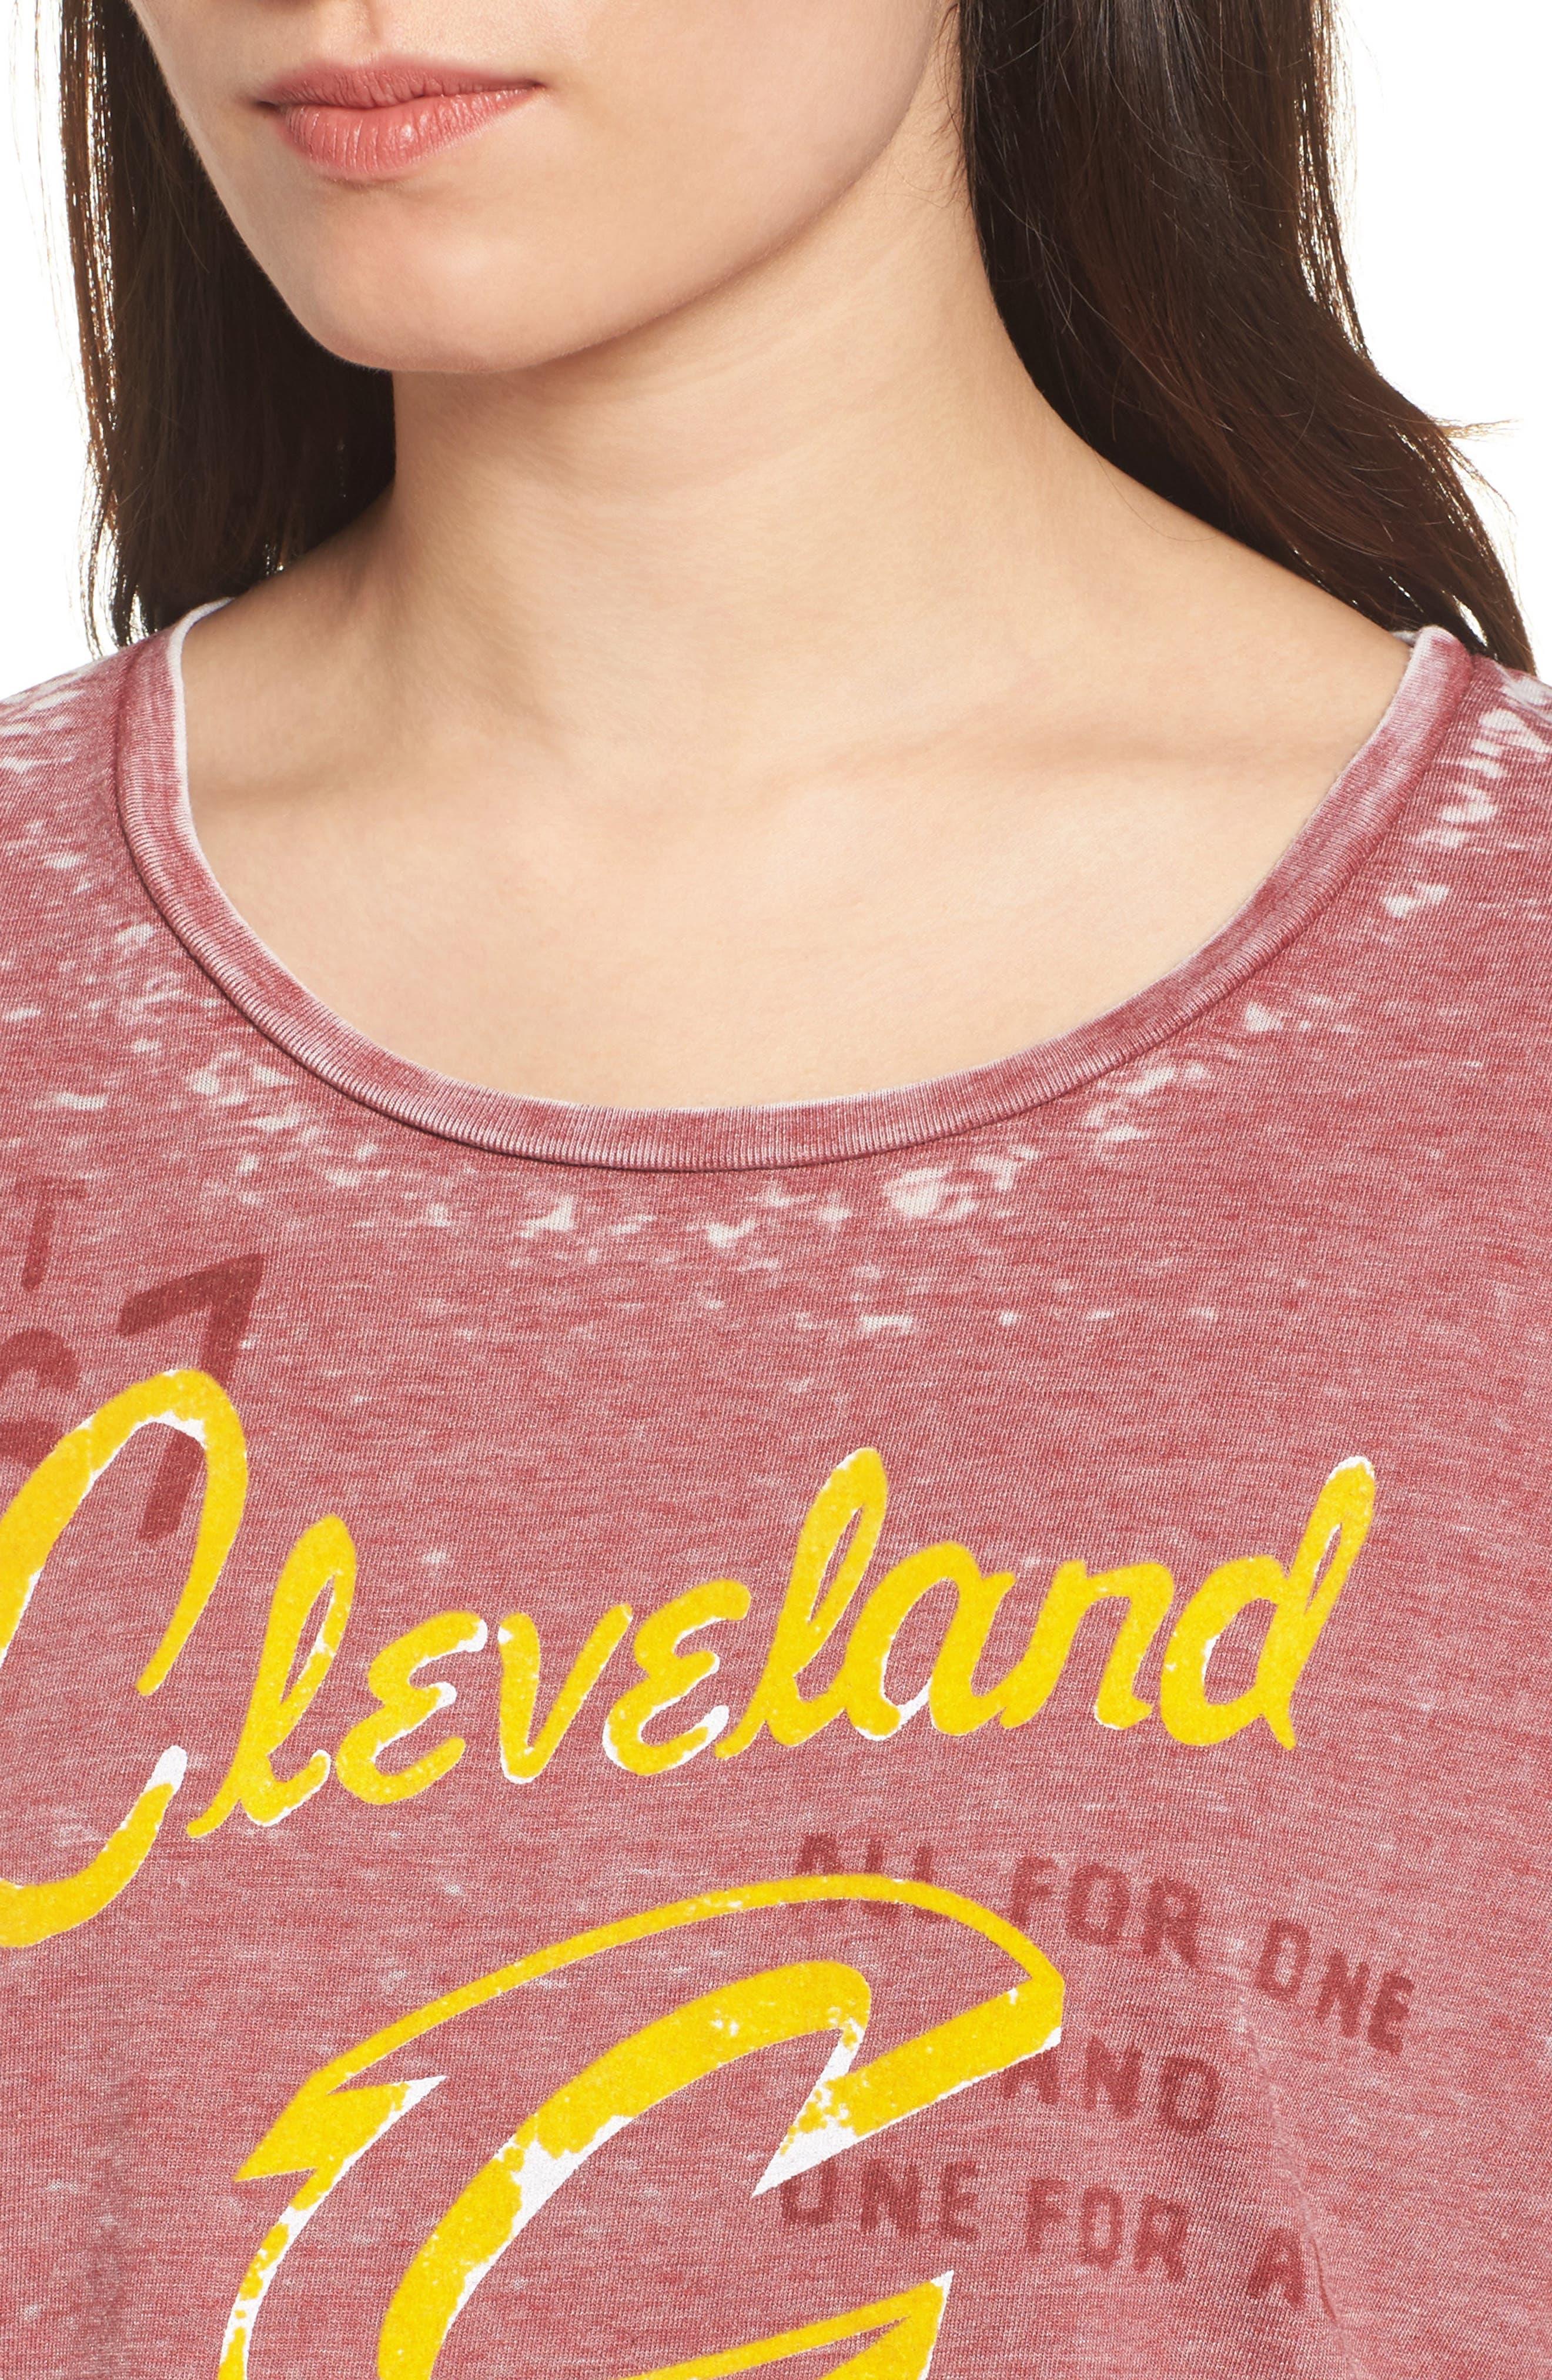 NBA Cleveland Cavaliers Tee,                             Alternate thumbnail 4, color,                             Crimson